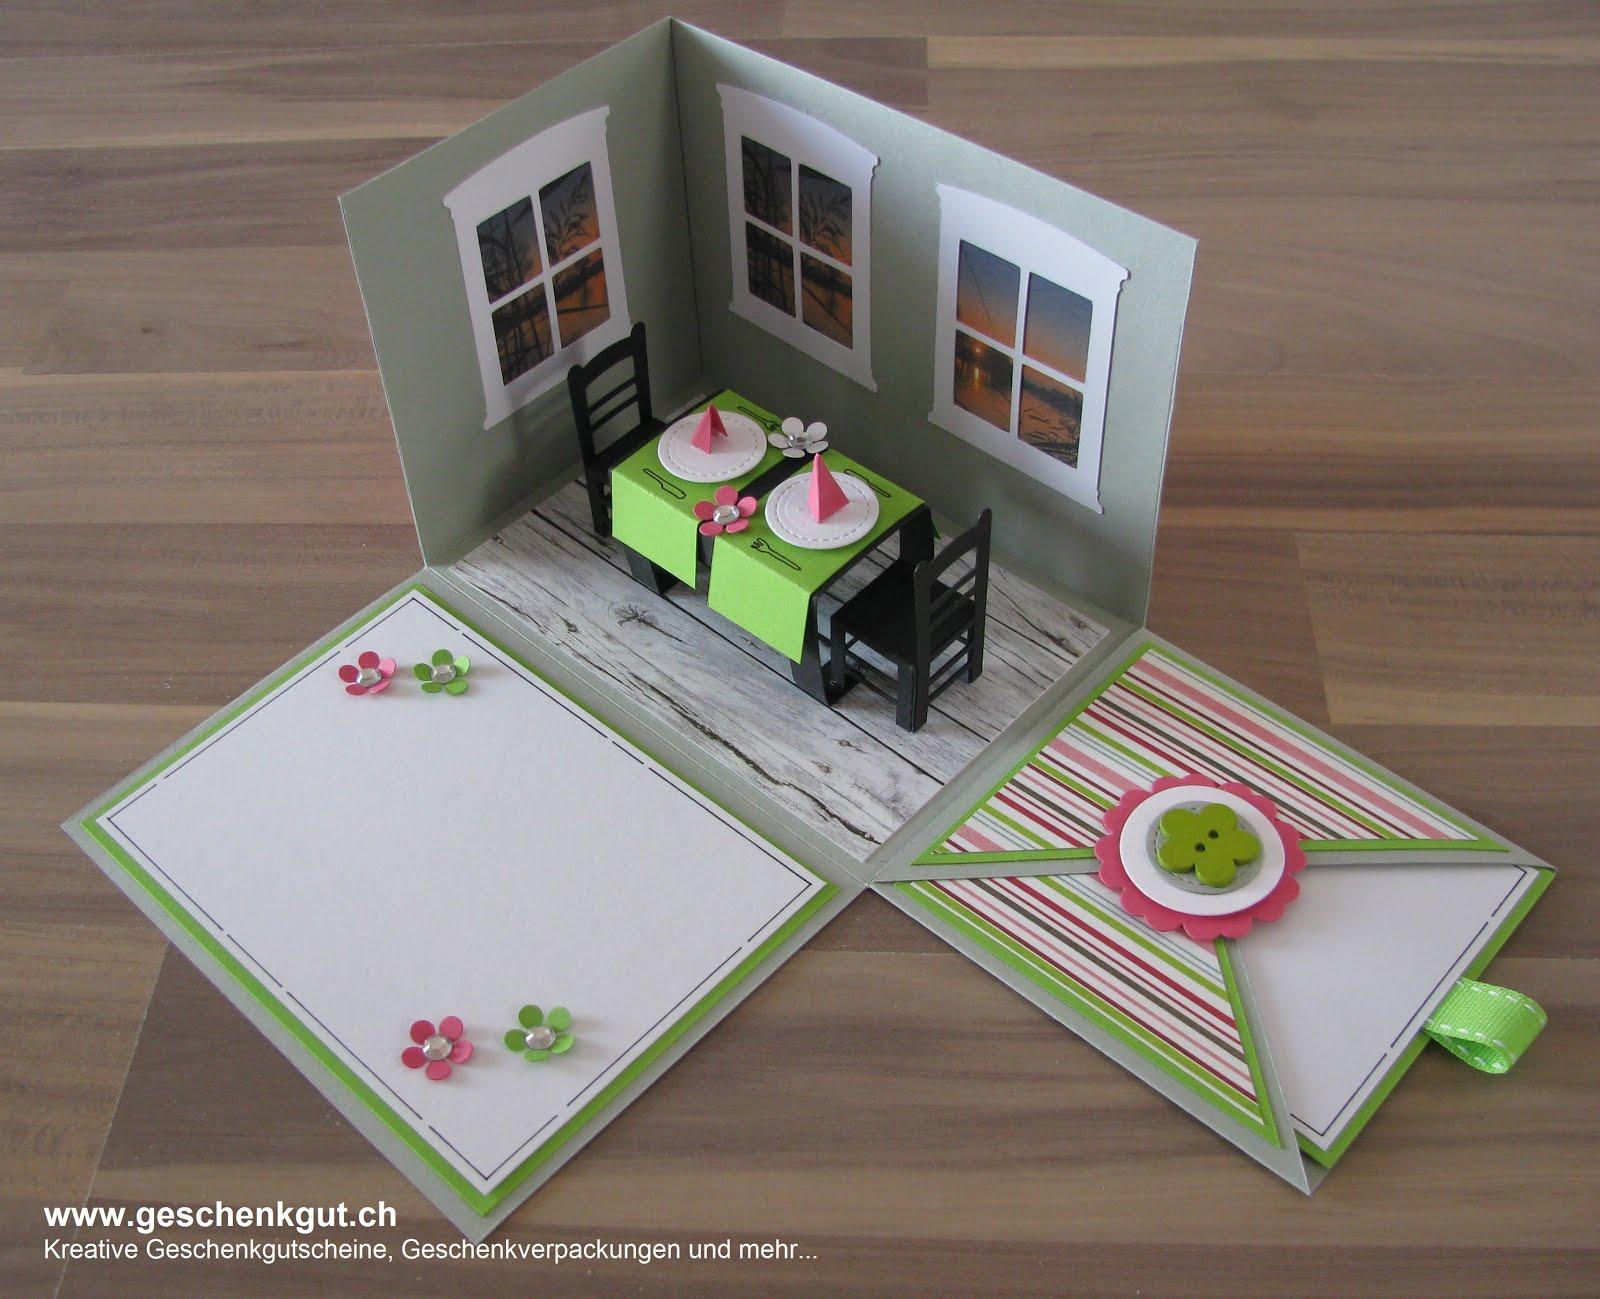 geschenkgut juli 2016. Black Bedroom Furniture Sets. Home Design Ideas